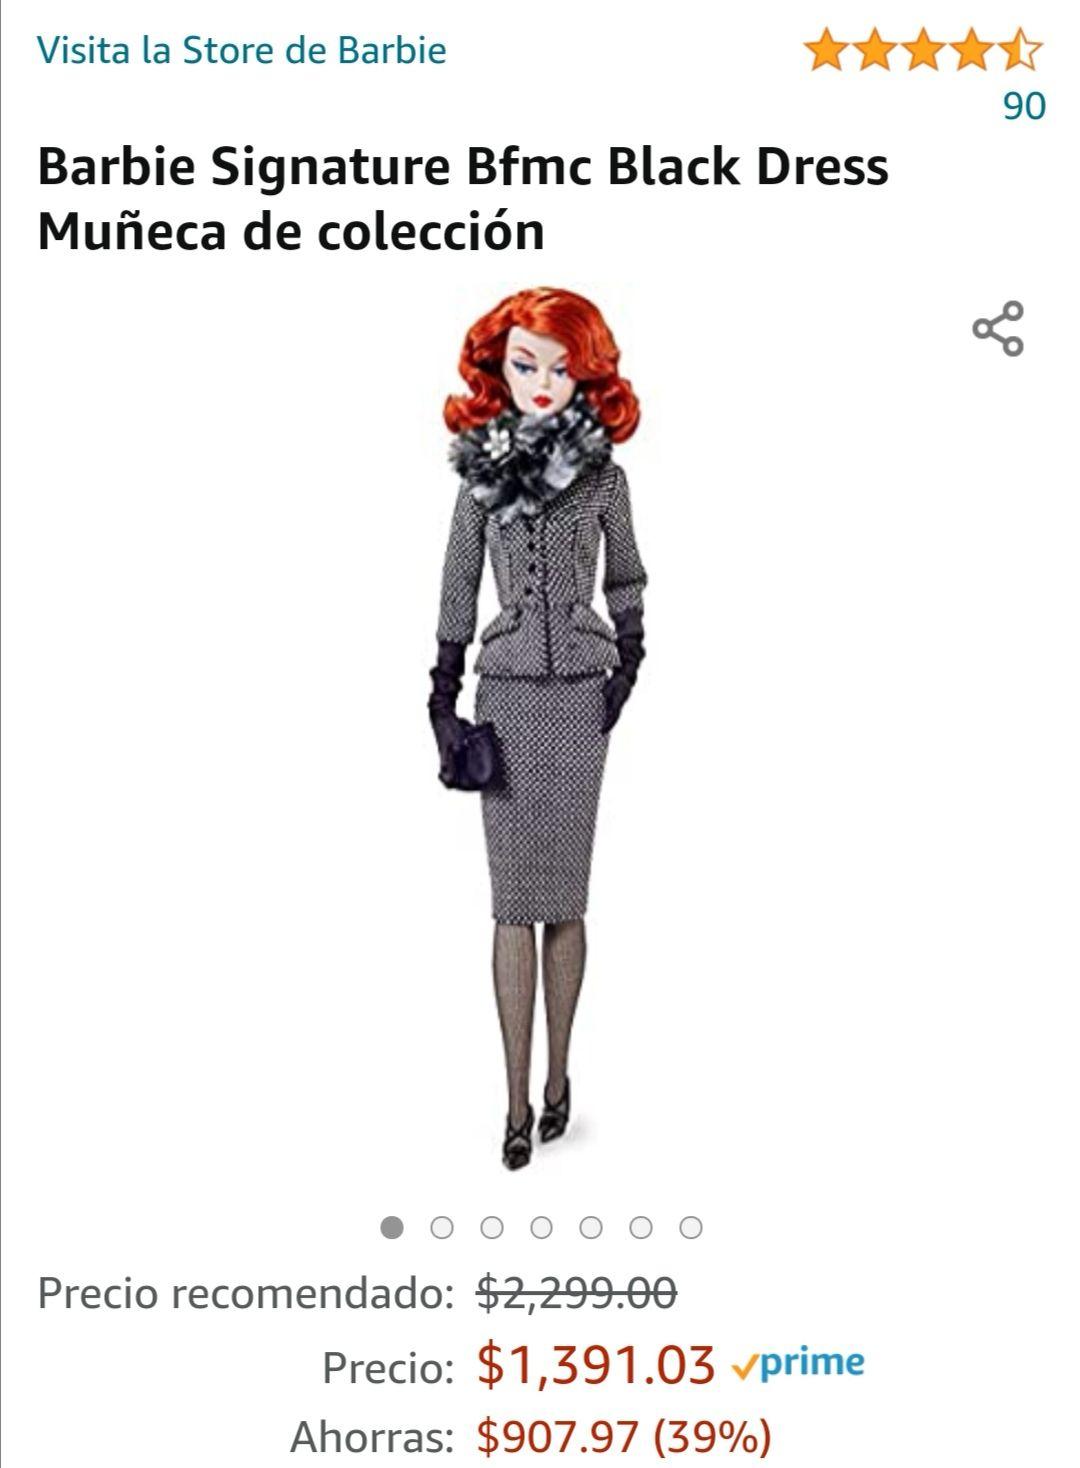 AMAZON: BARBIE SIGNATURE BFMC BLACK DRESS